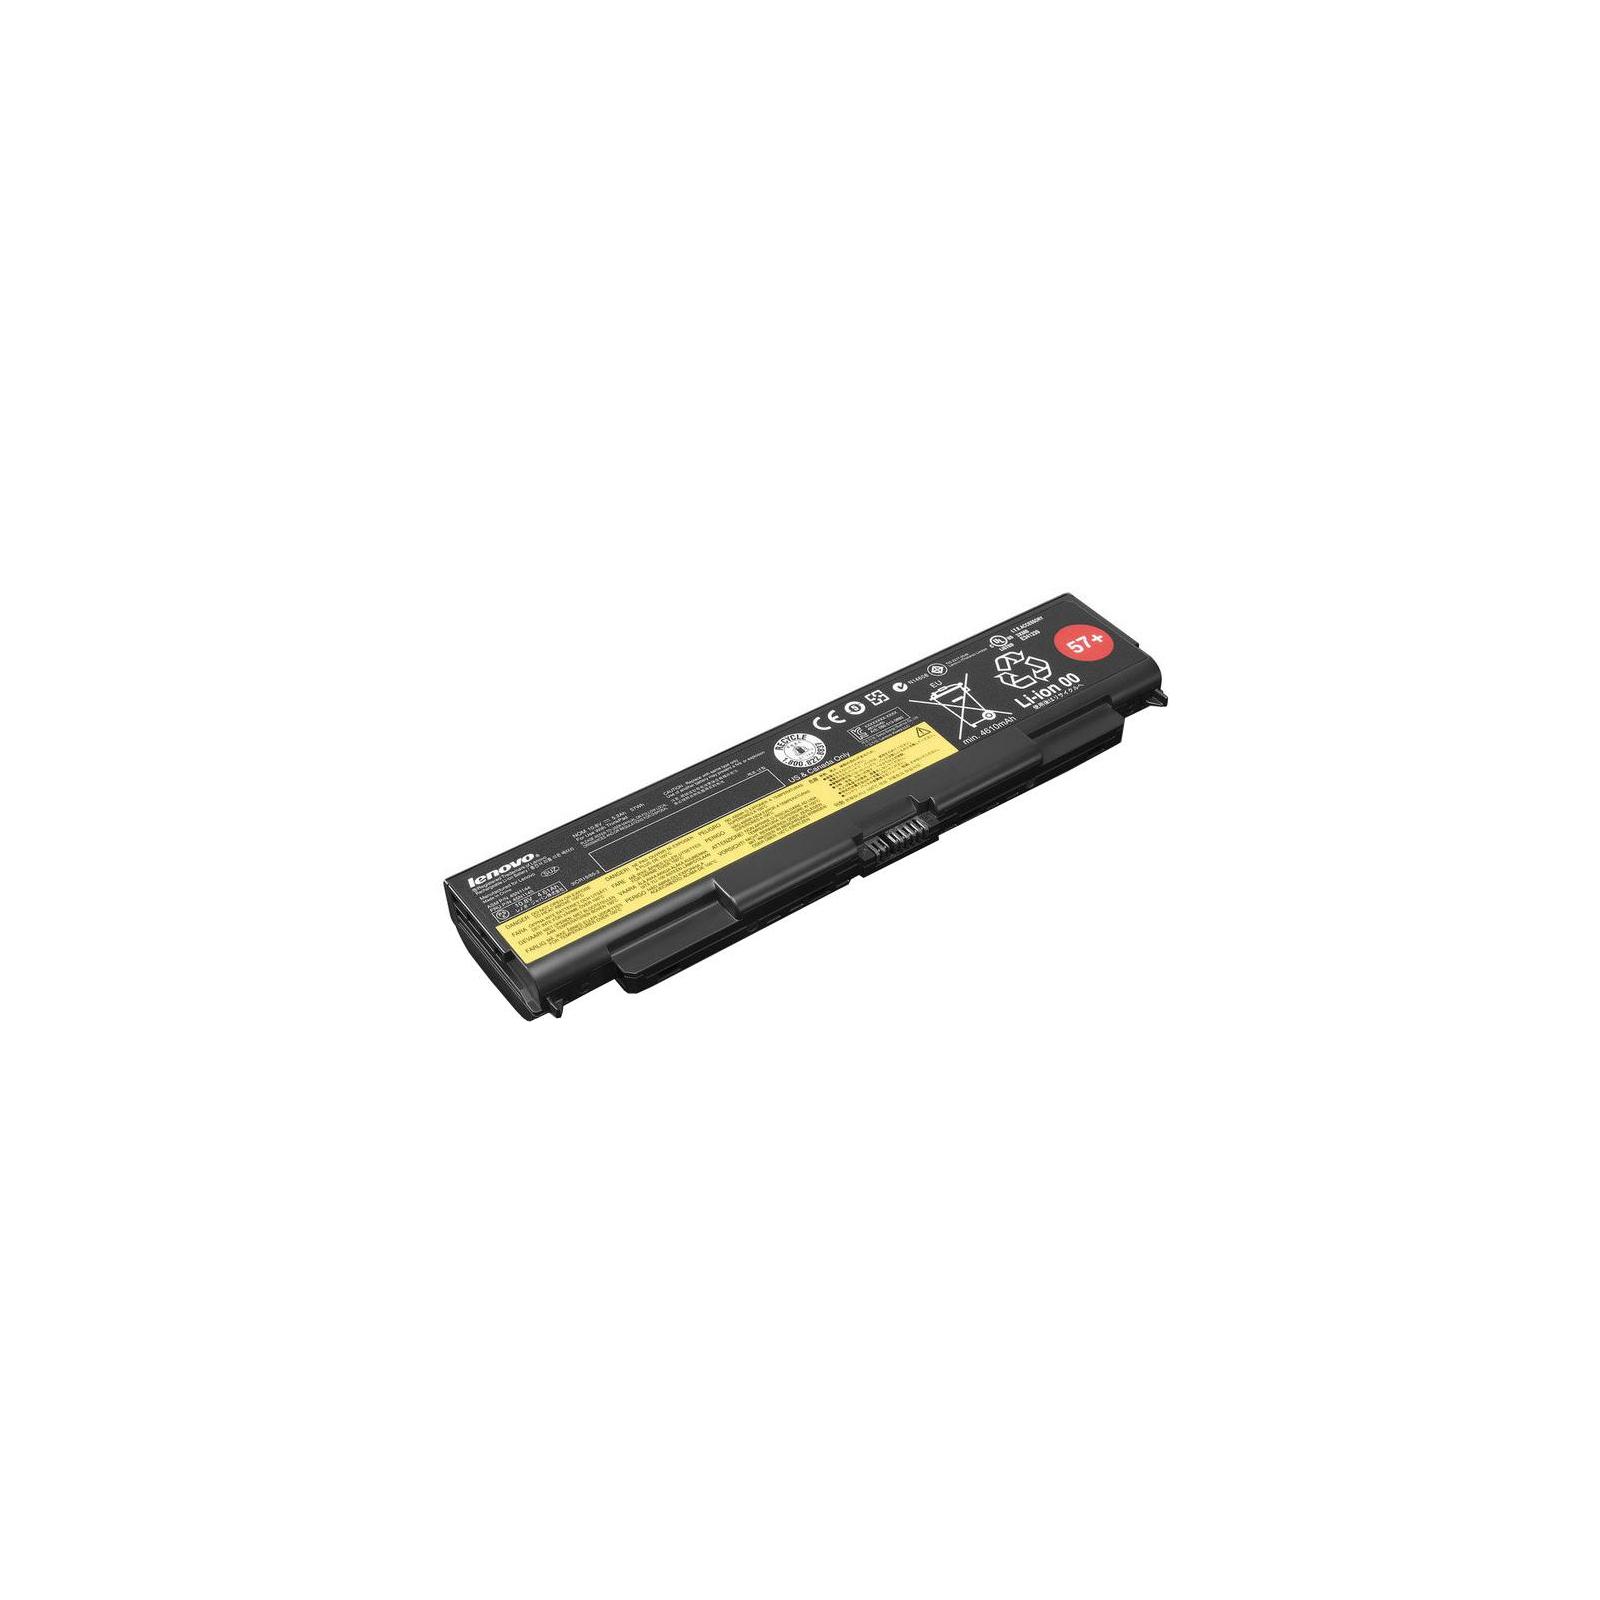 Аккумулятор для ноутбука Lenovo ThinkPad T440p (57), 4400mAh (48Wh), 6cell, 10.8V, Li-ion (A47205)